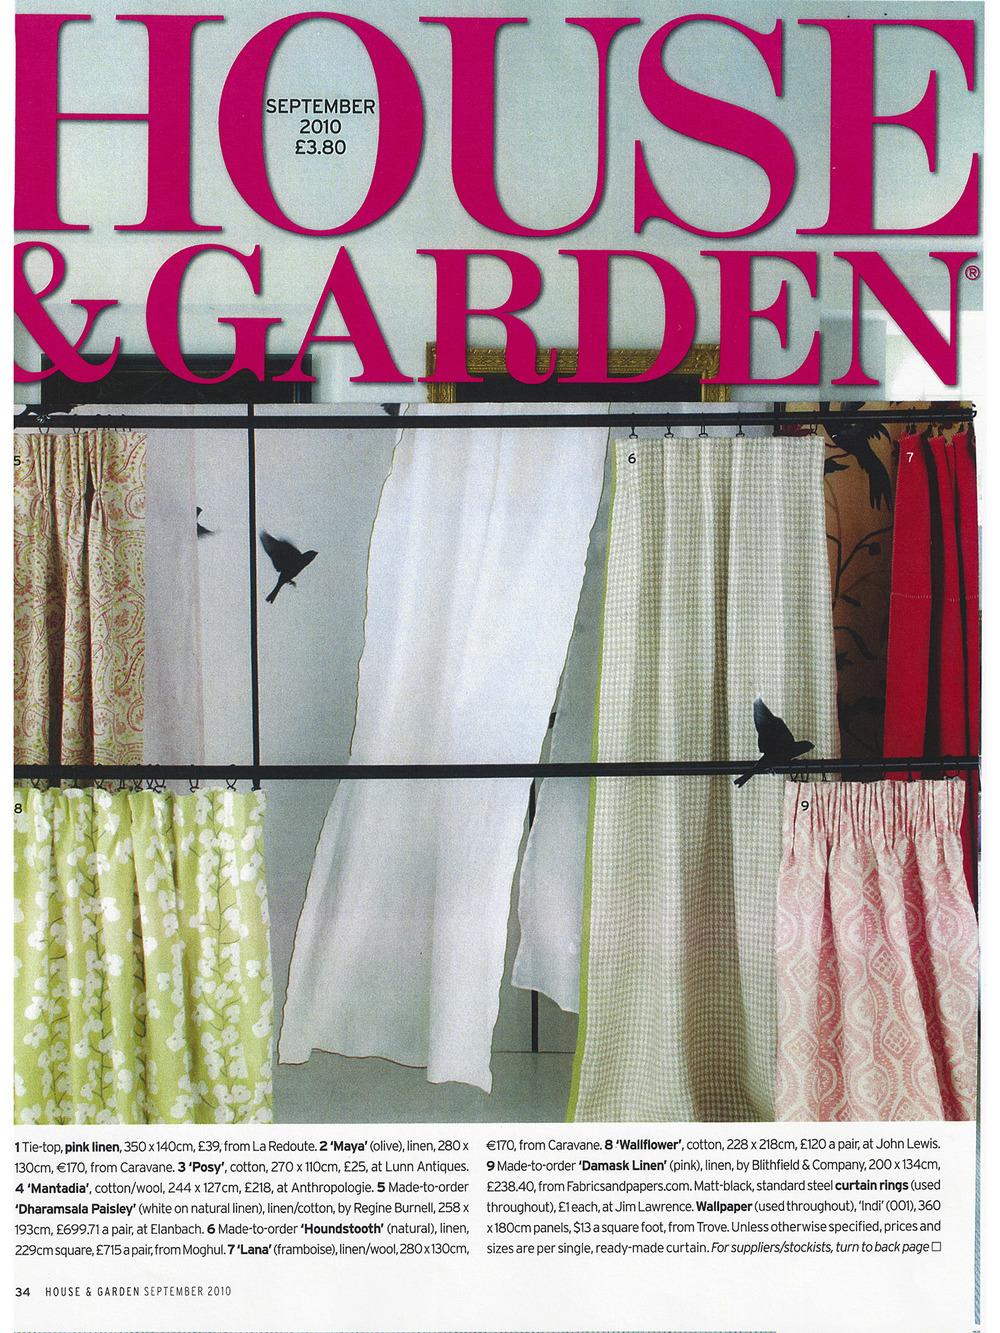 2010 September -House & Garden.jpeg